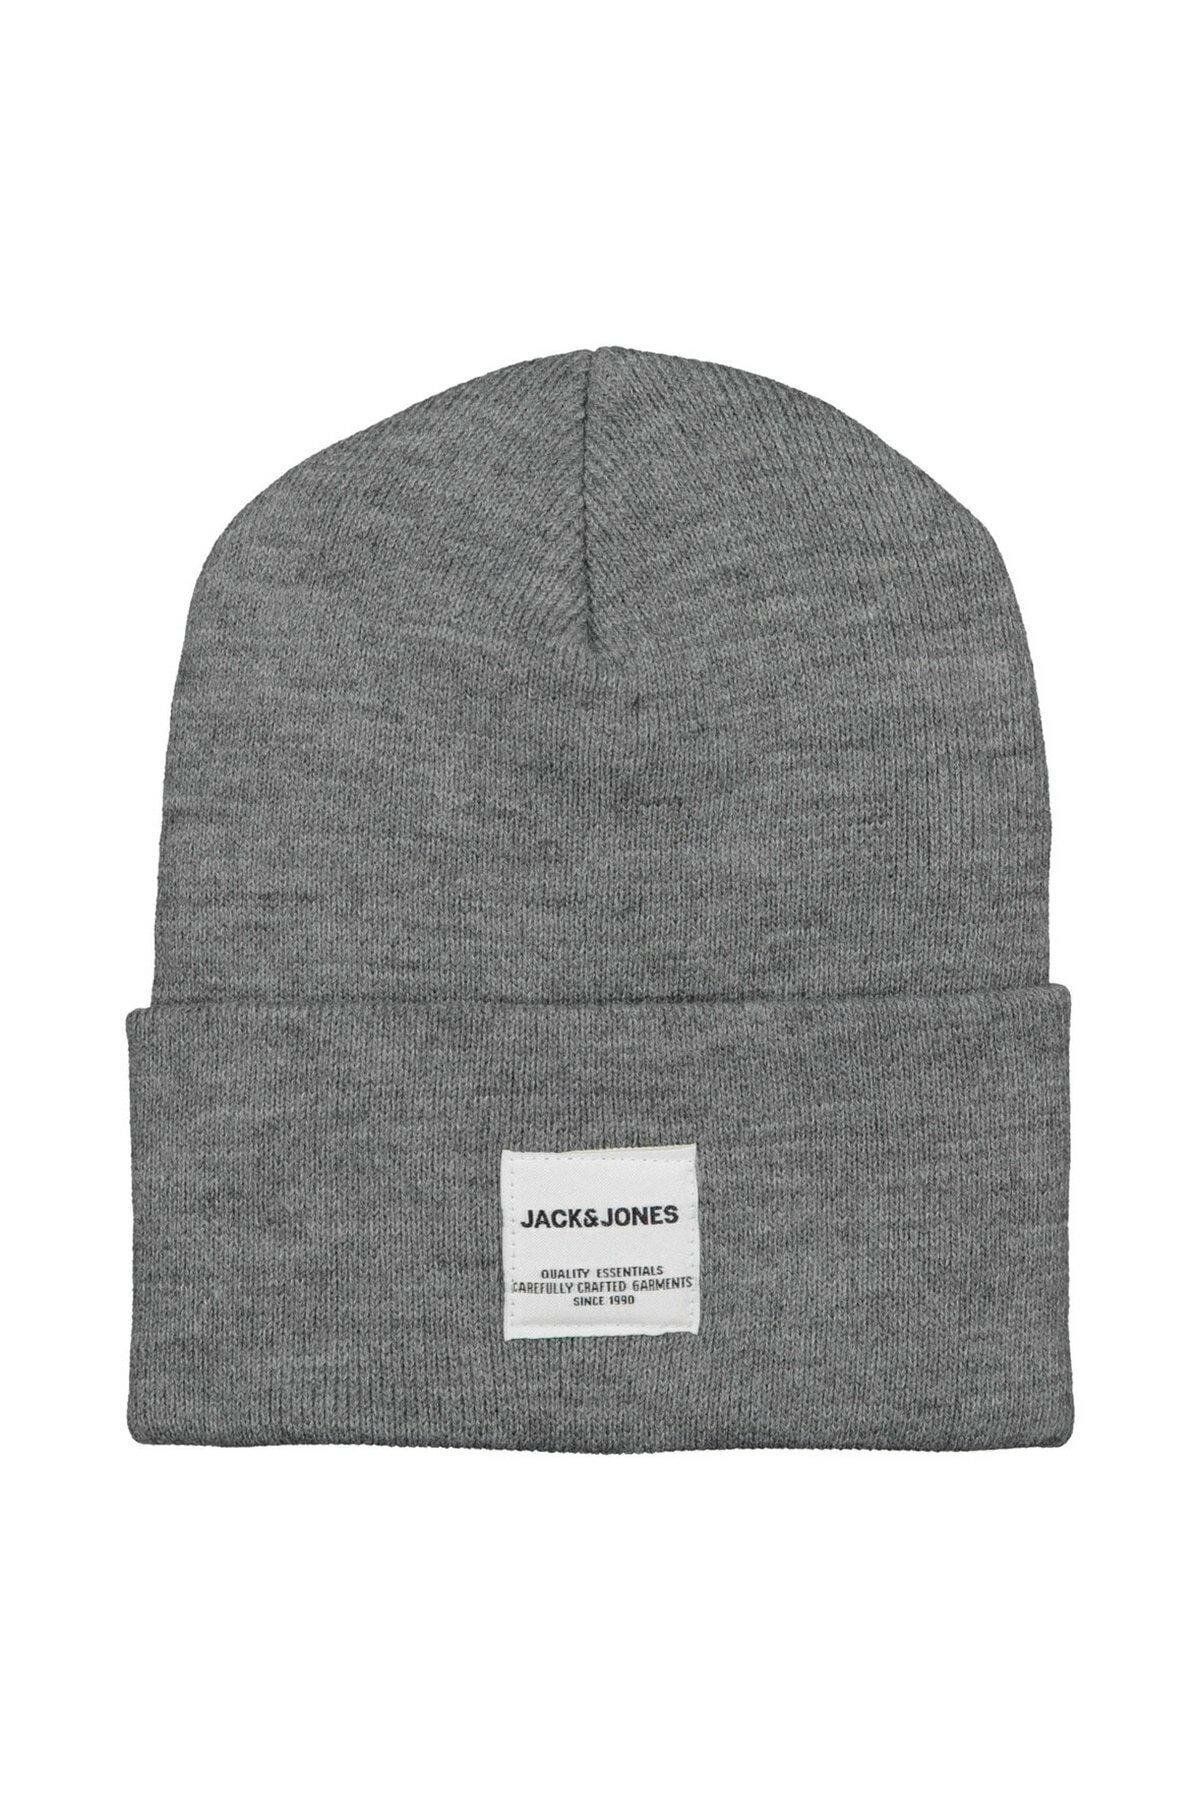 https://resim.oddamoda.com/12150627greymelange/greymelan/jack-jones-erkek-bere-jaclong-knit-beanie-12150627-017db828a073.jpg